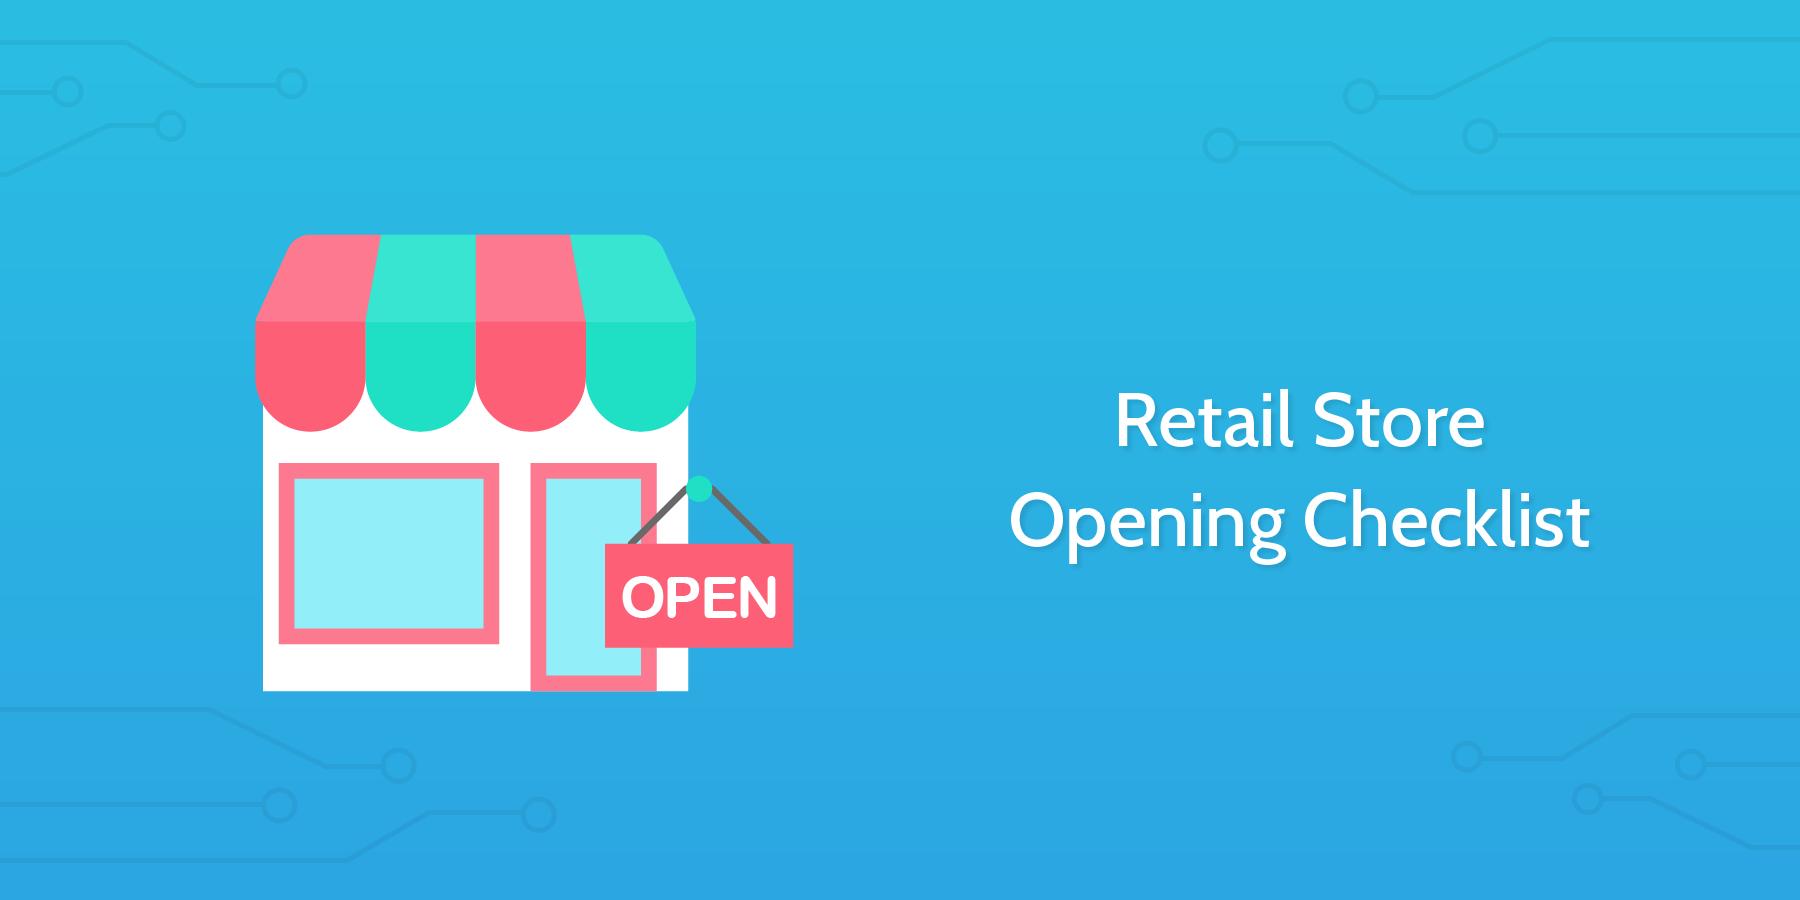 Retail Store Opening Checklist